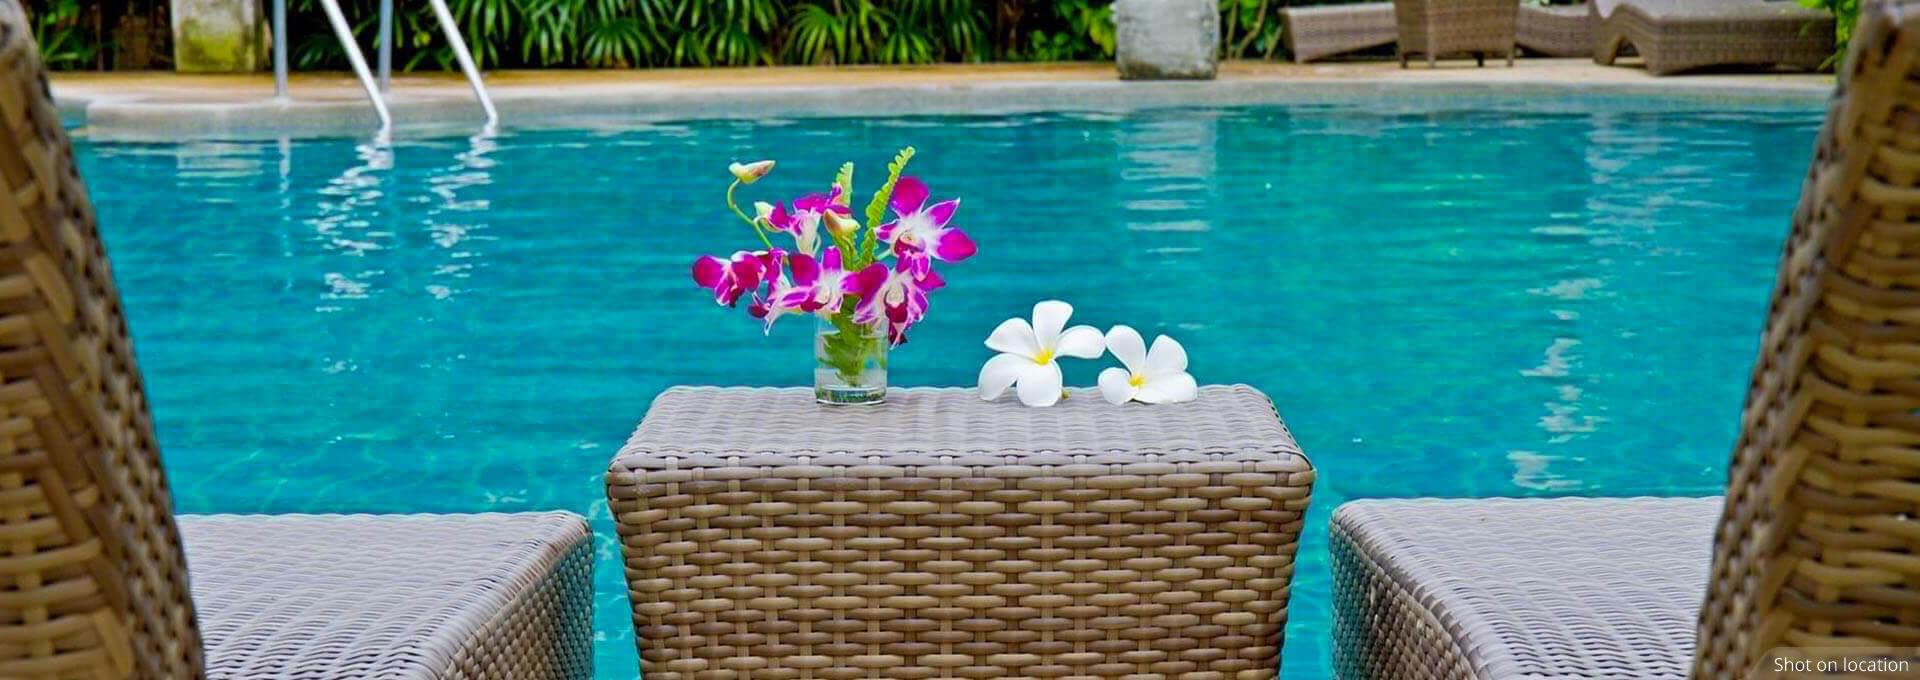 Swimming Pool inCypress by House of Hiranandani in Devanahalli, Bengaluru